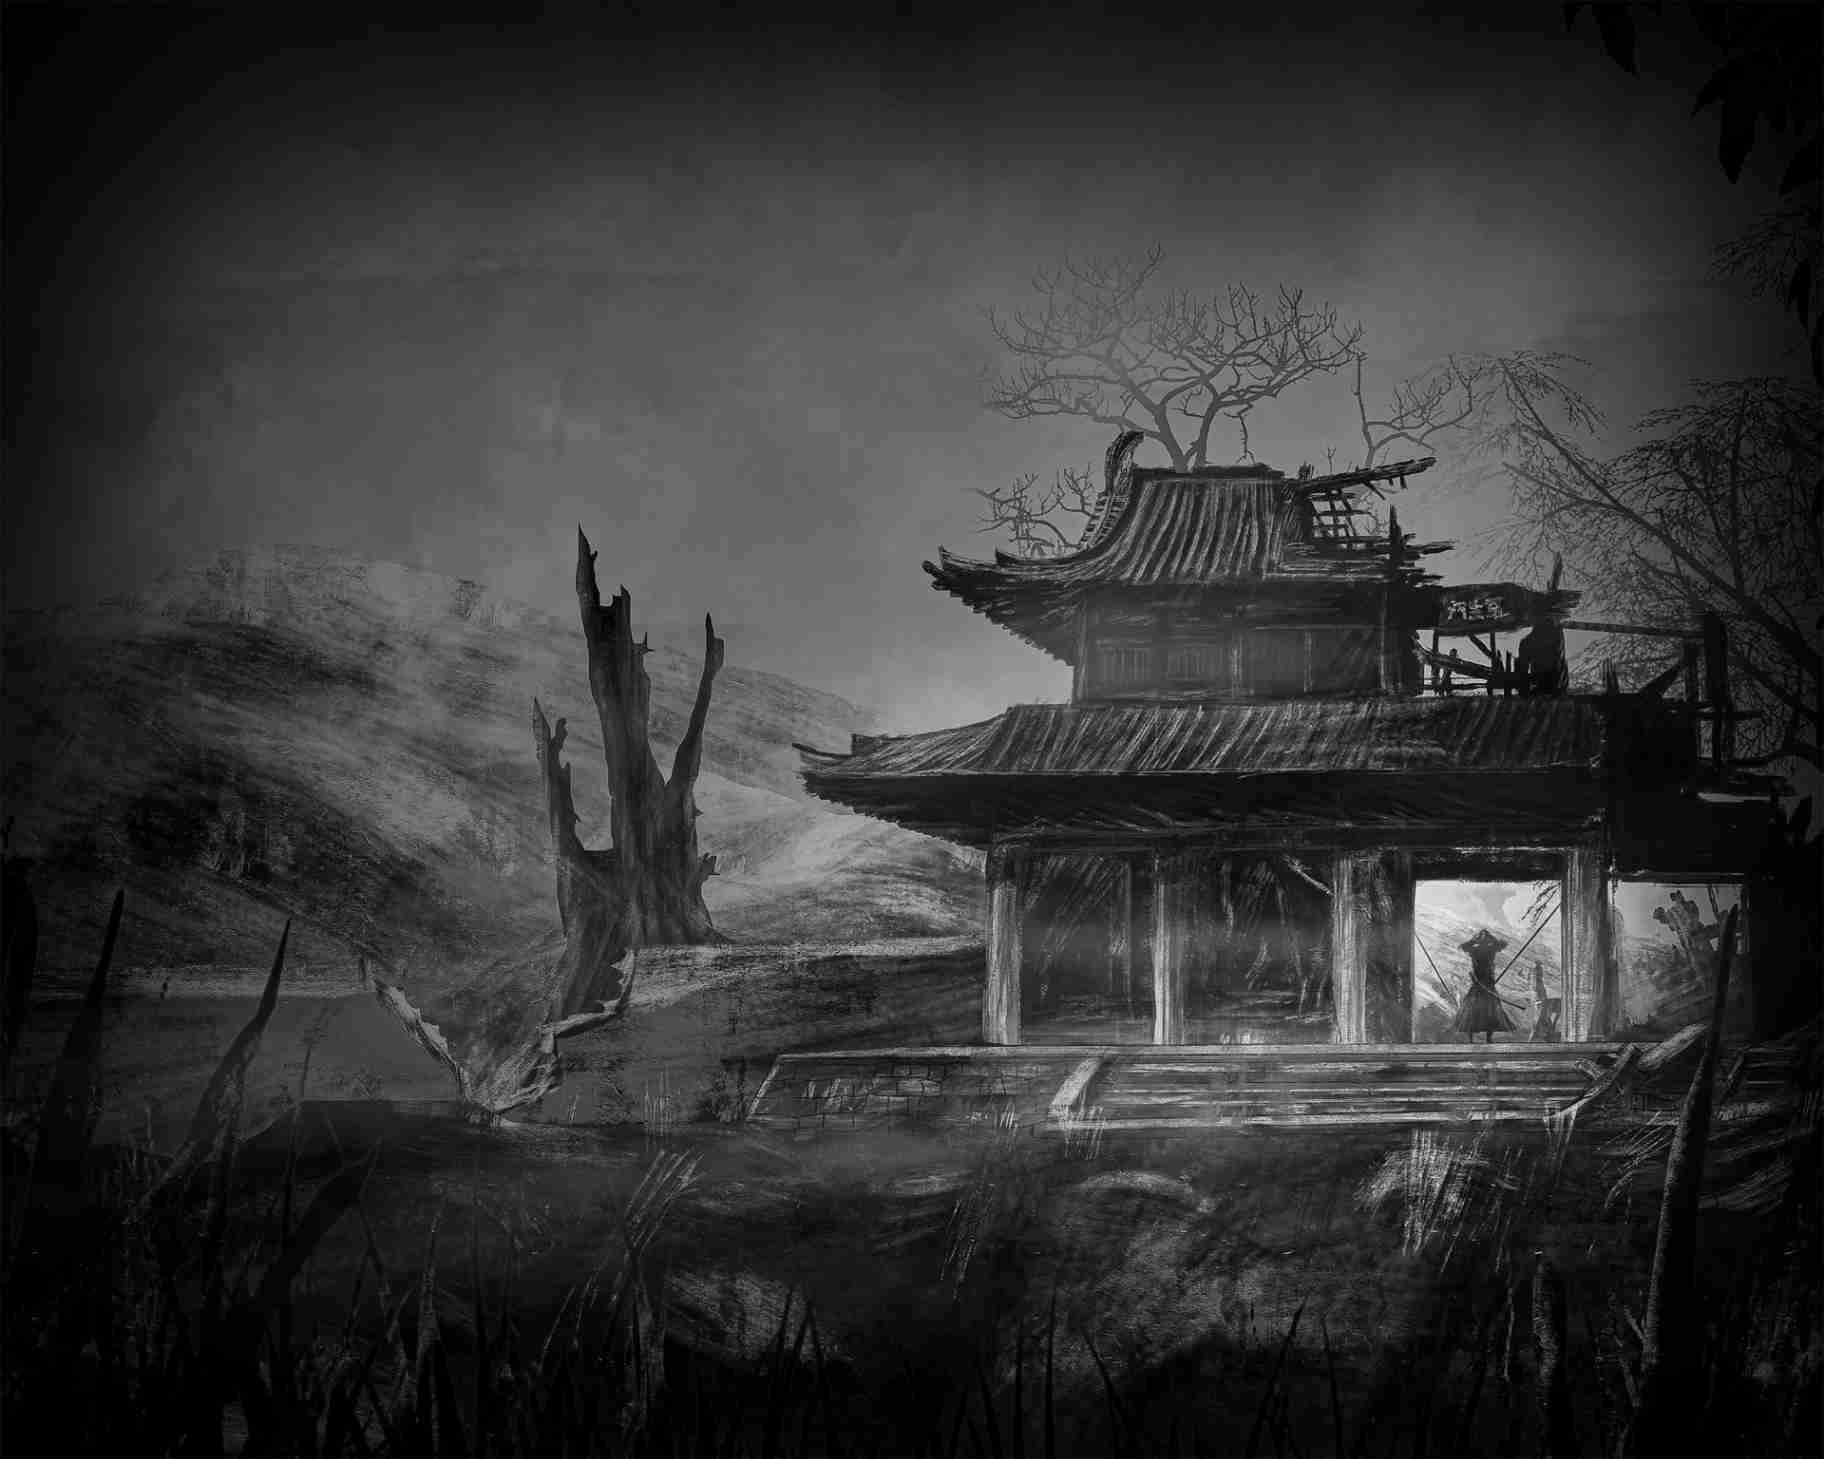 Obra: Rashomon and the Demon